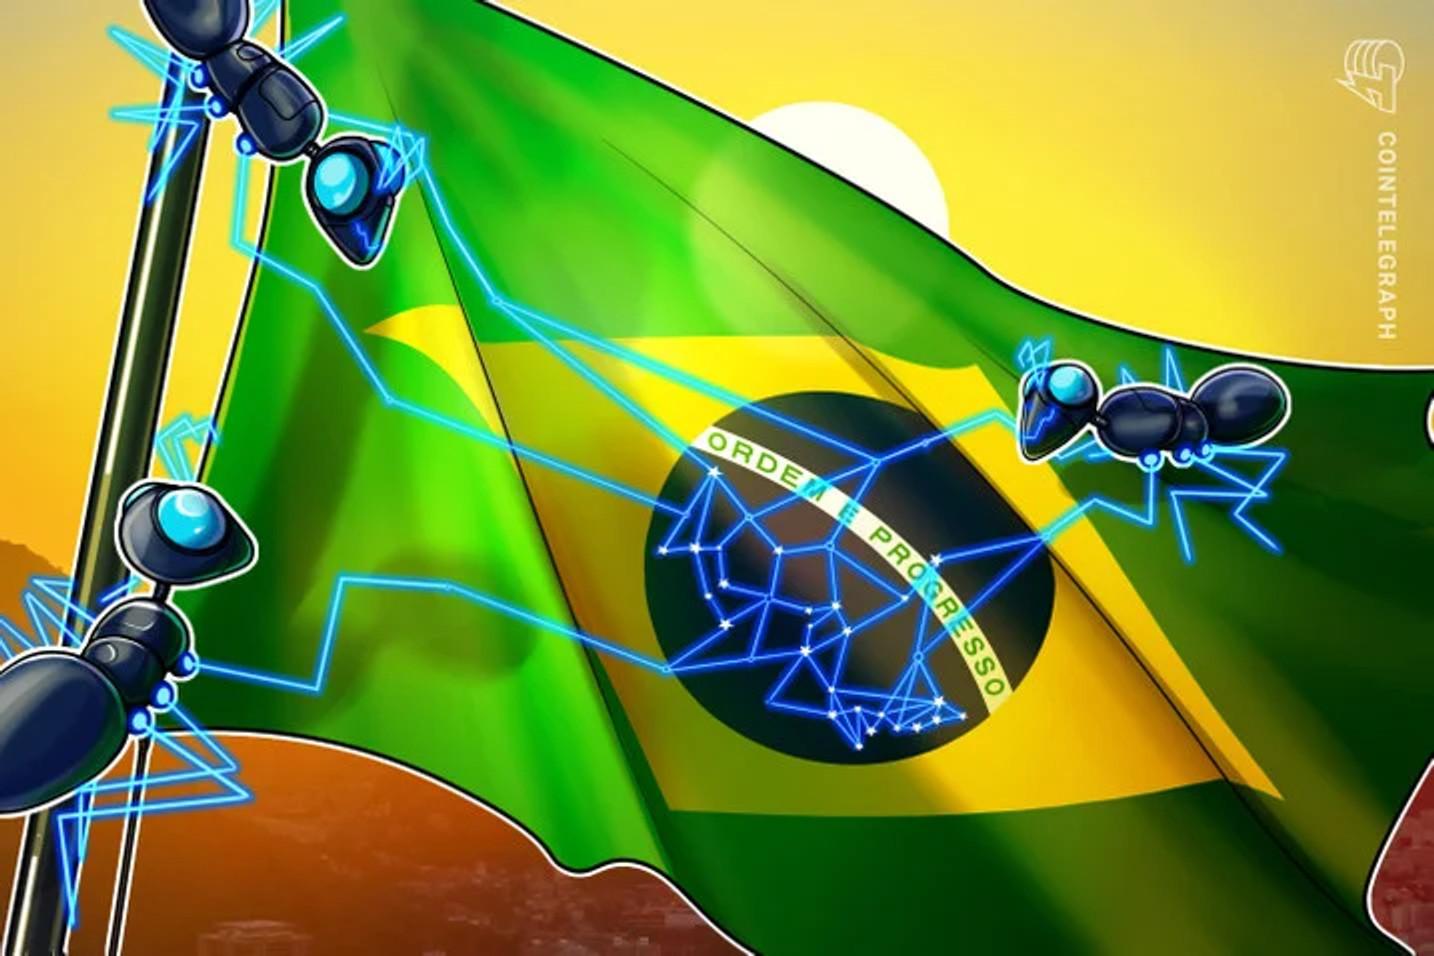 Tribunal de Contas de Santa Catarina implementa sistema de CPF em blockchain da Receita Federal